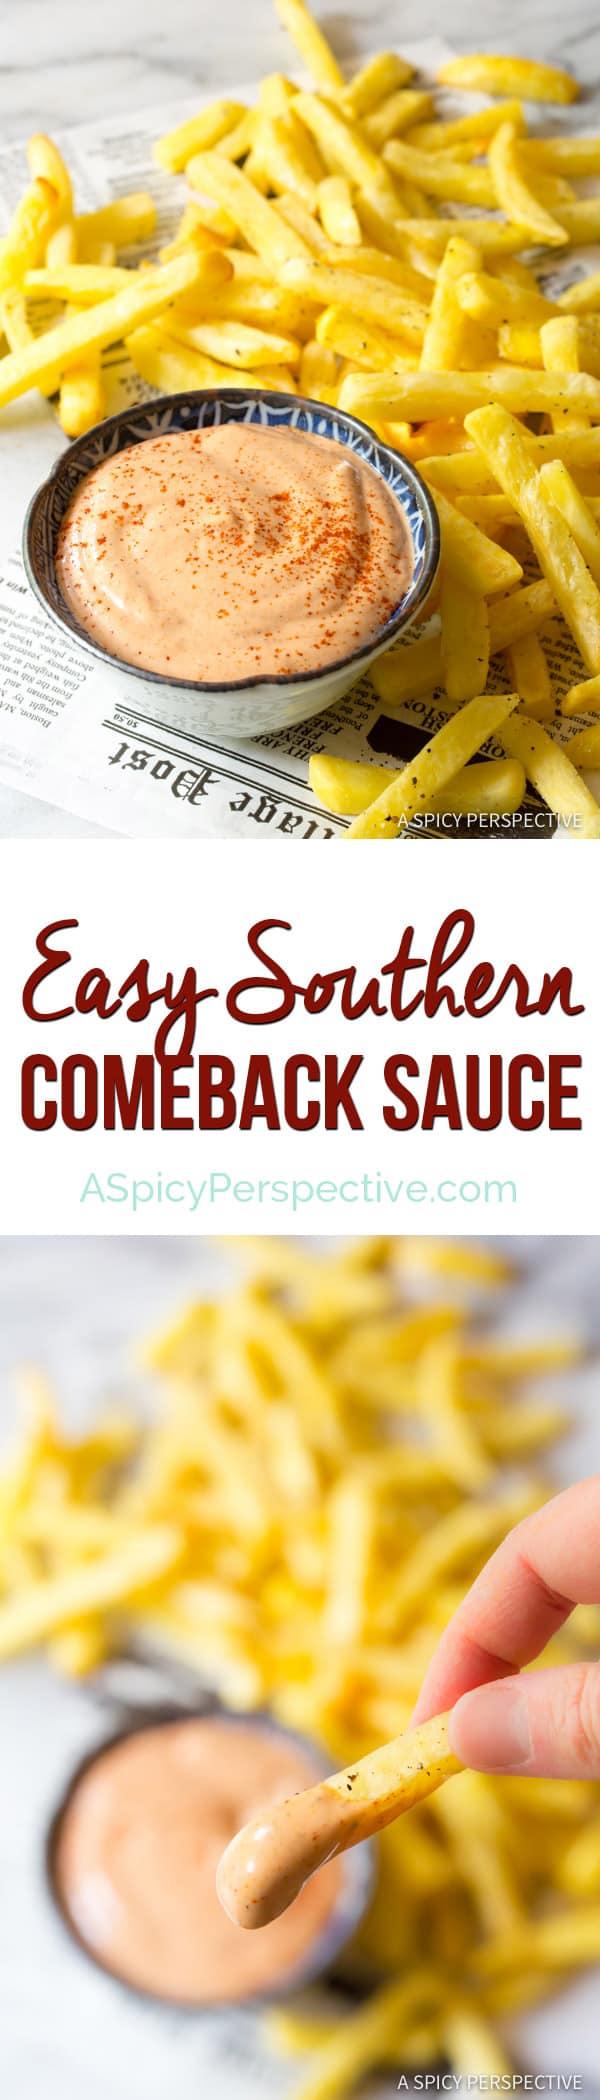 Easy Southern Comeback Sauce Recipe | ASpicyPerspective.com